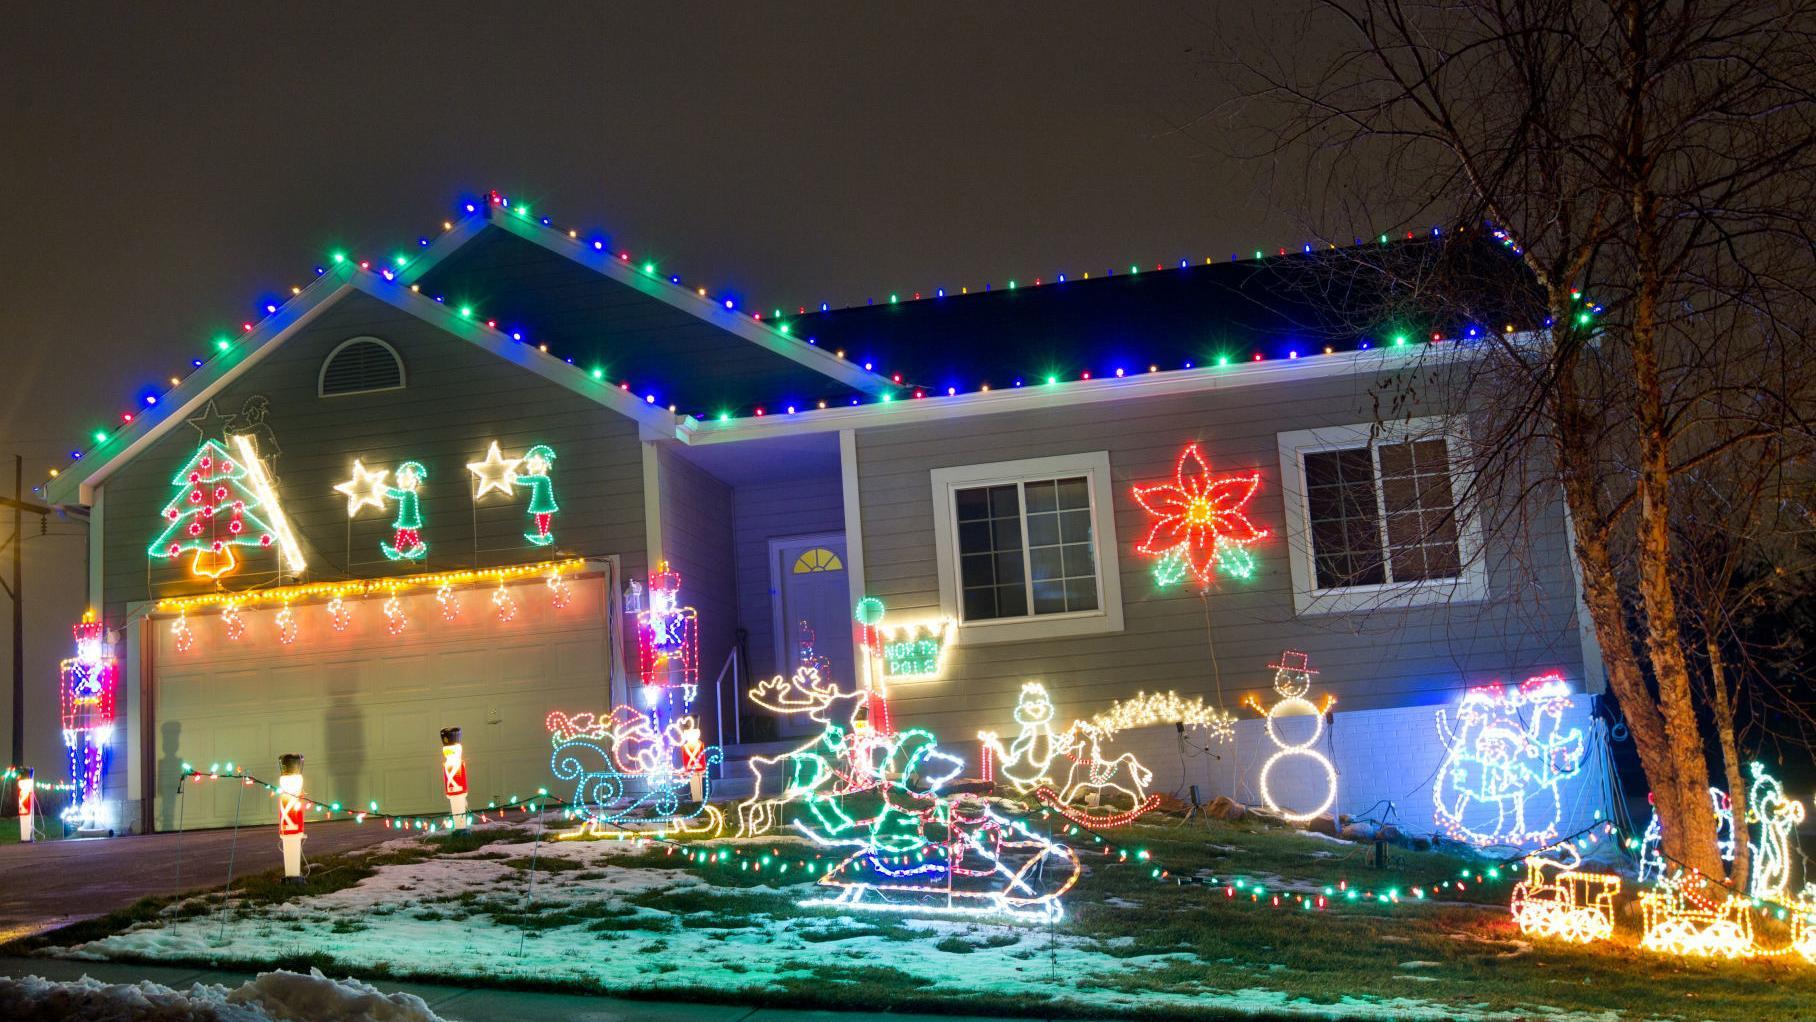 Christmas Lights Map 2020 Omaha 2019's best Omaha area neighborhoods to see holiday lights